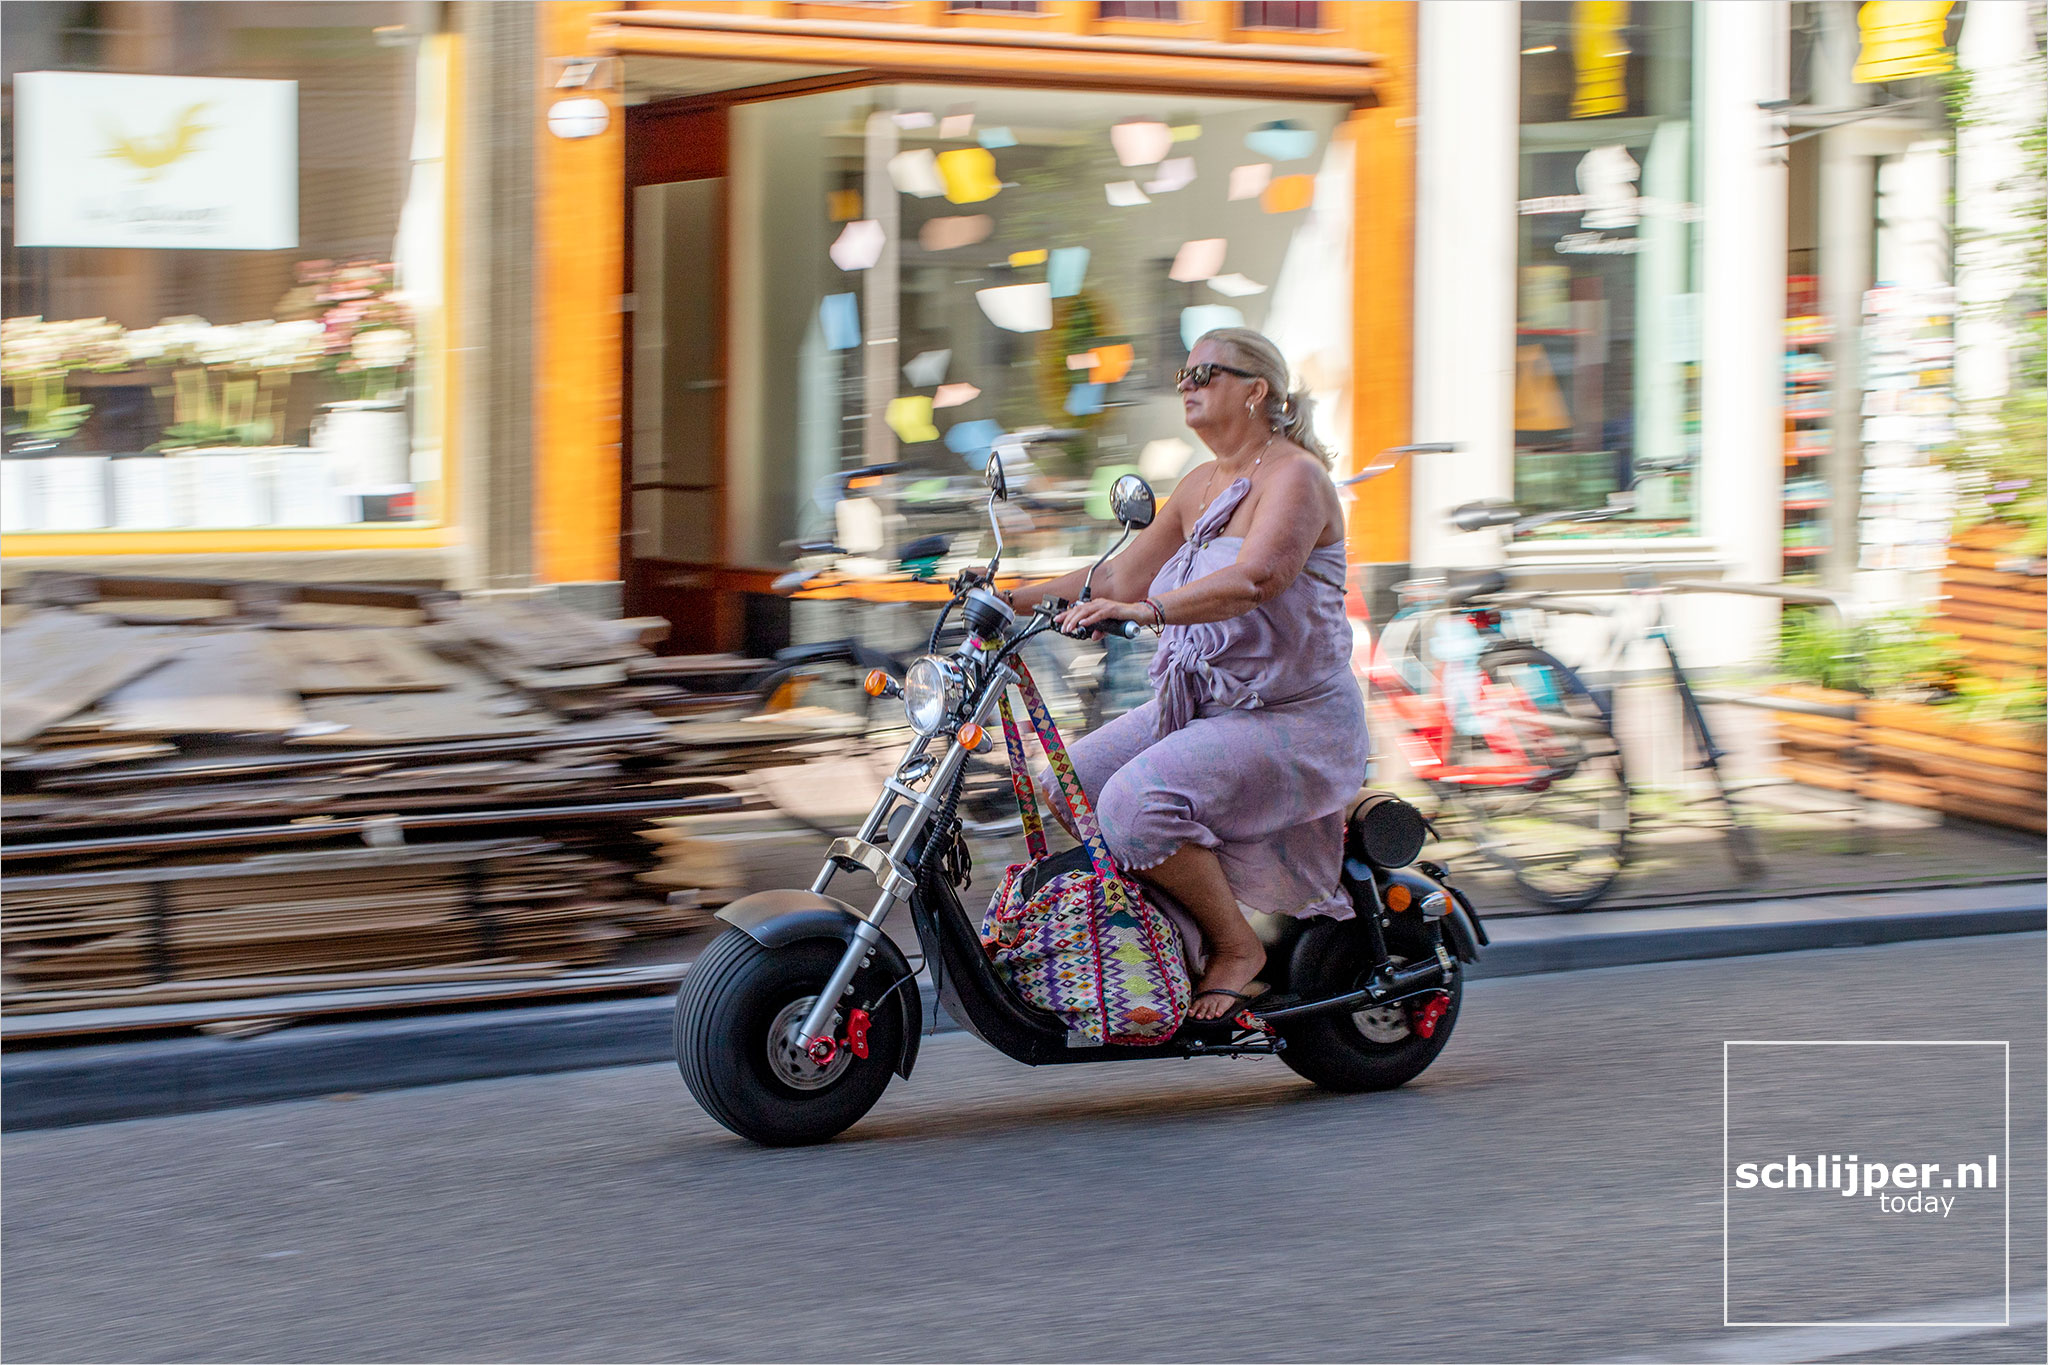 Nederland, Amsterdam, 25 juni 2020